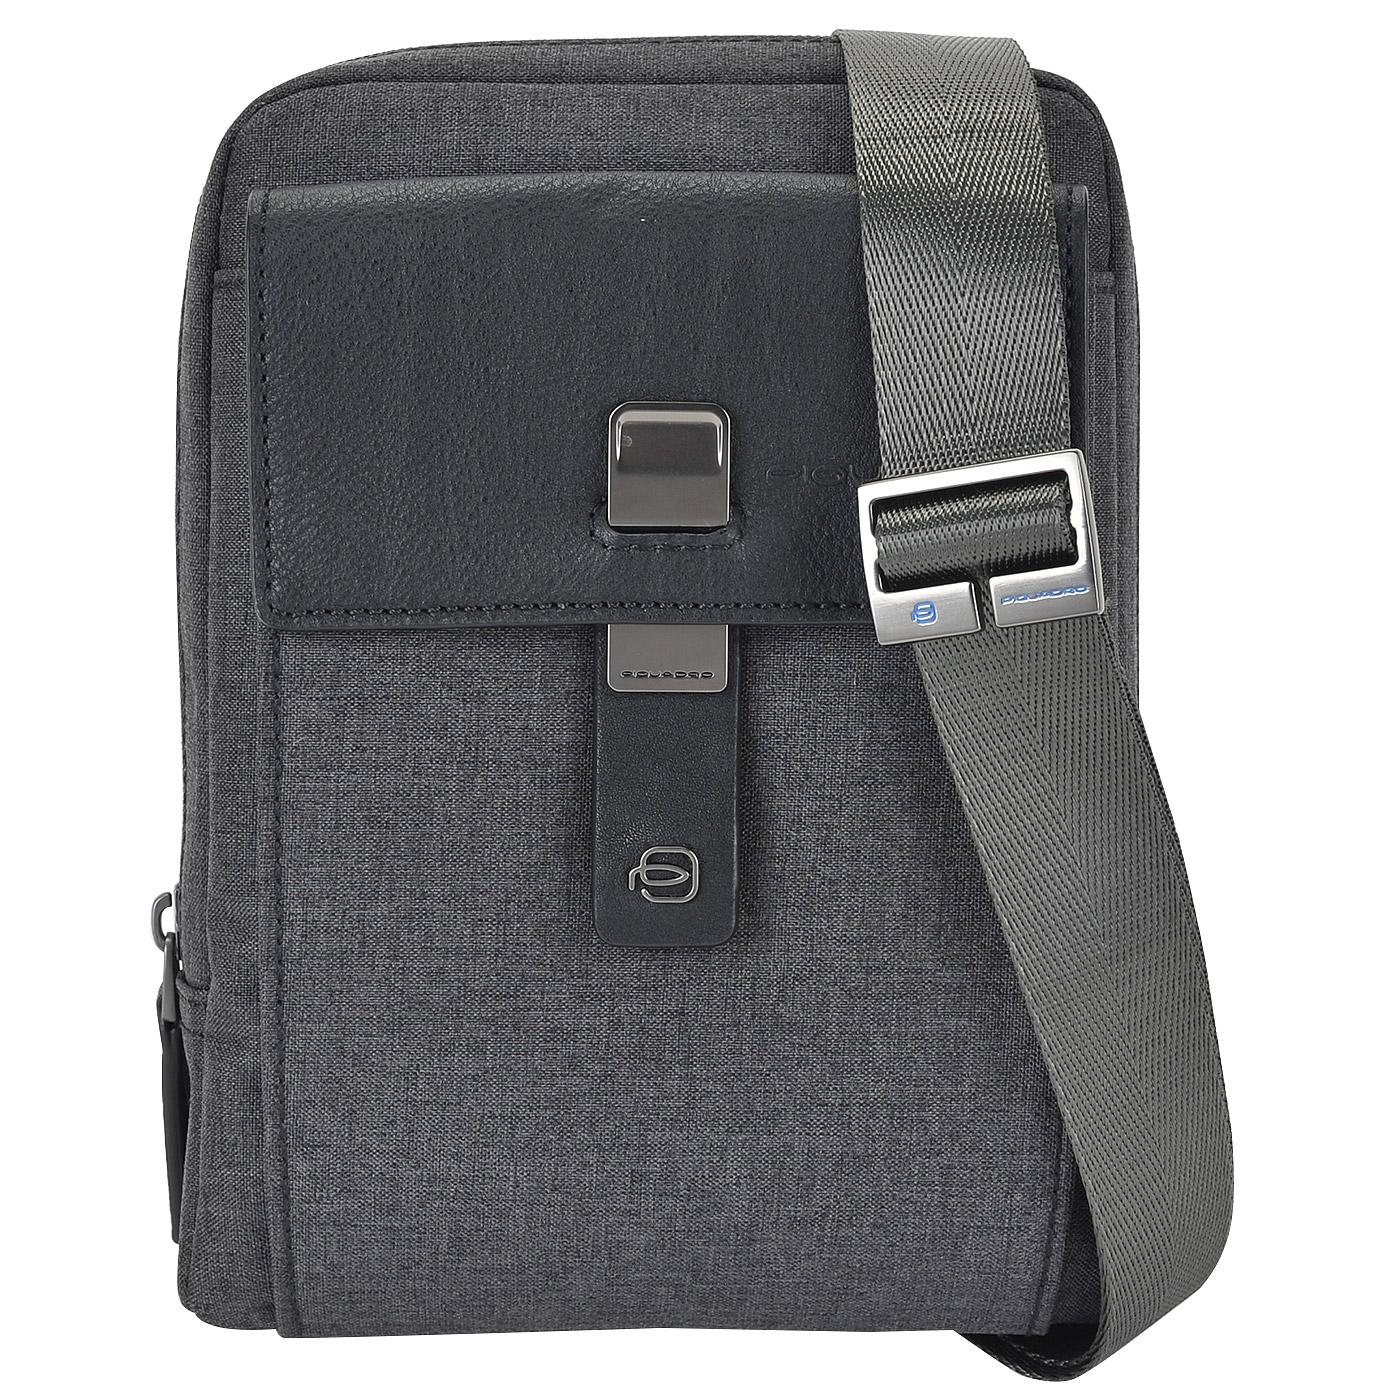 153f4b62bb5c Мужская текстильная сумка через плечо Piquadro Yukon Мужская текстильная  сумка через плечо Piquadro Yukon ...